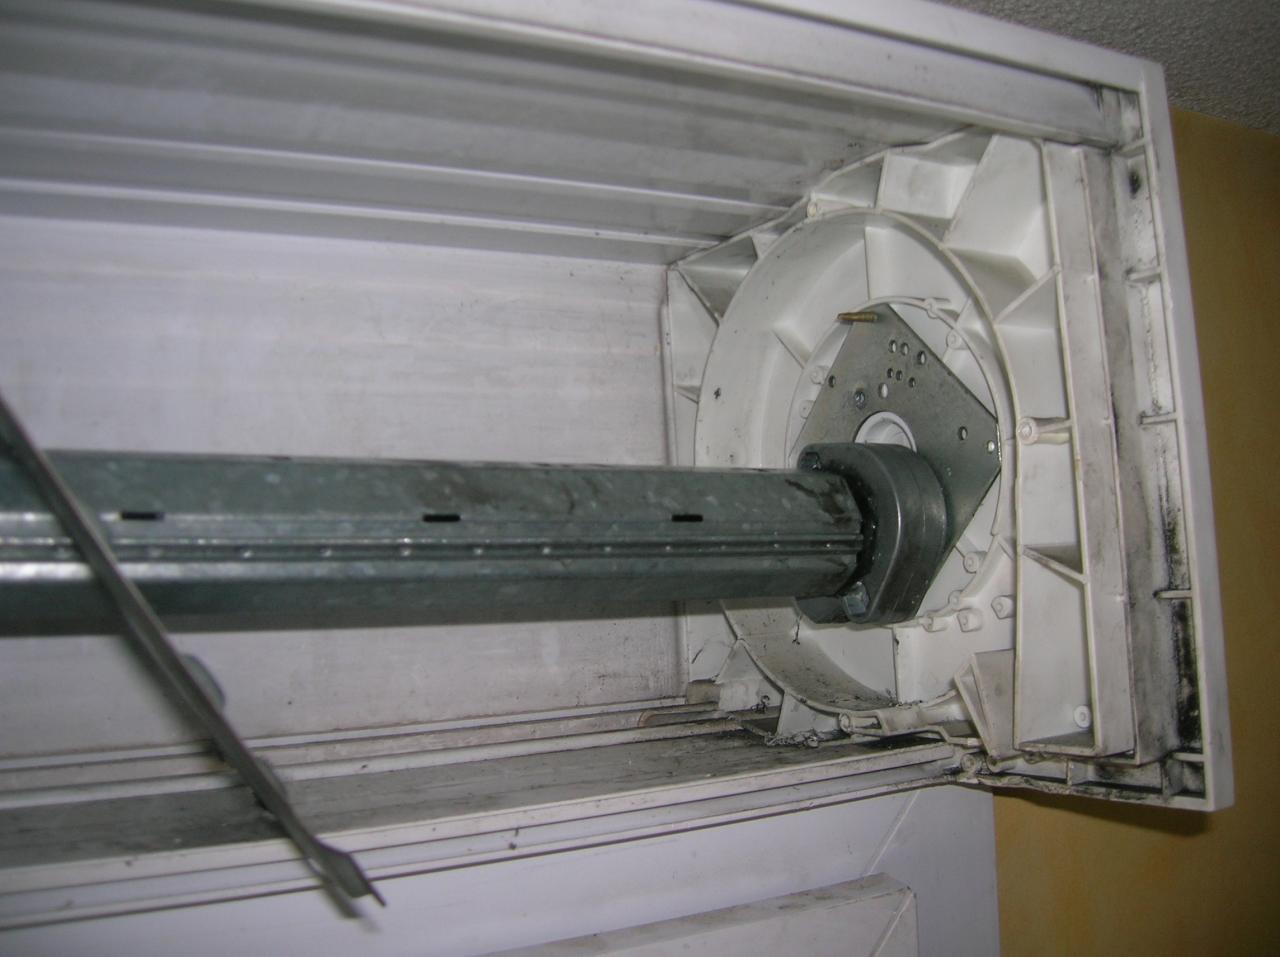 Porte Garage Electrique Demonter Volet Roulant Manuel